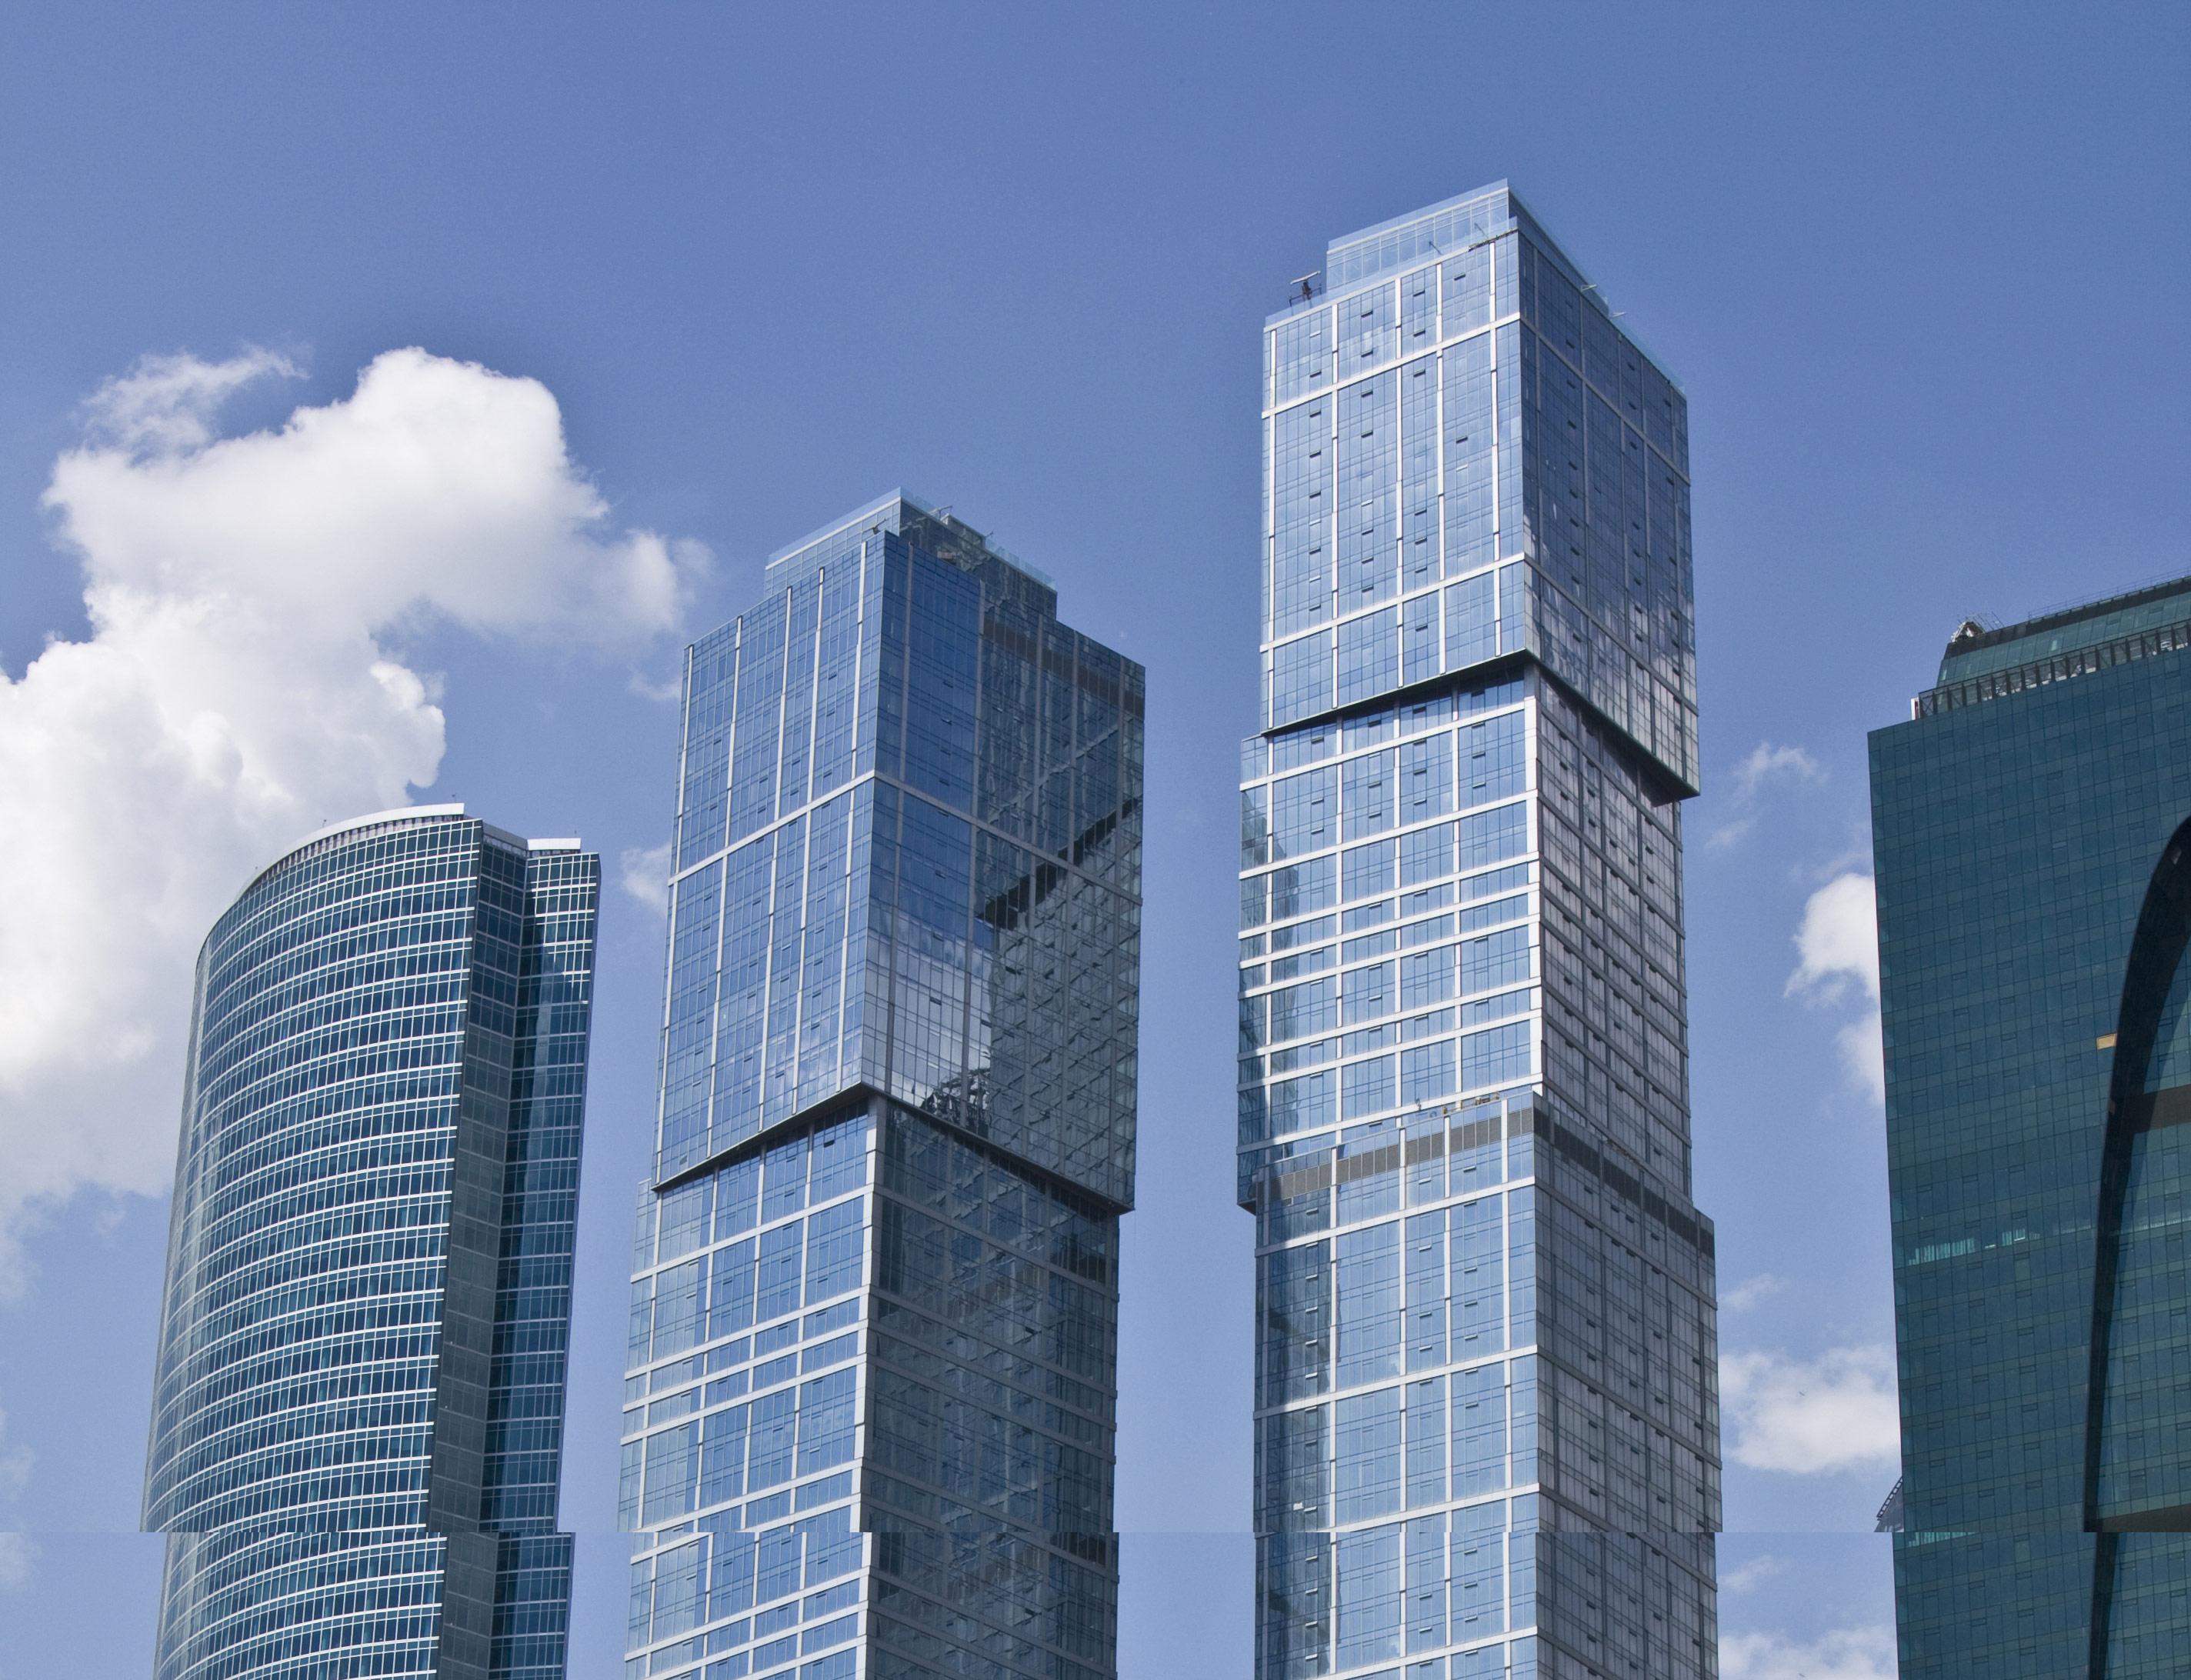 6-е место: 302м   «Город столиц» (башня «Москва») Количество этажей: 76 Адрес: «Москва-Сити», 9-й участок Средняя цена: 627тыс.руб. /кв. м   Небоскреб справа